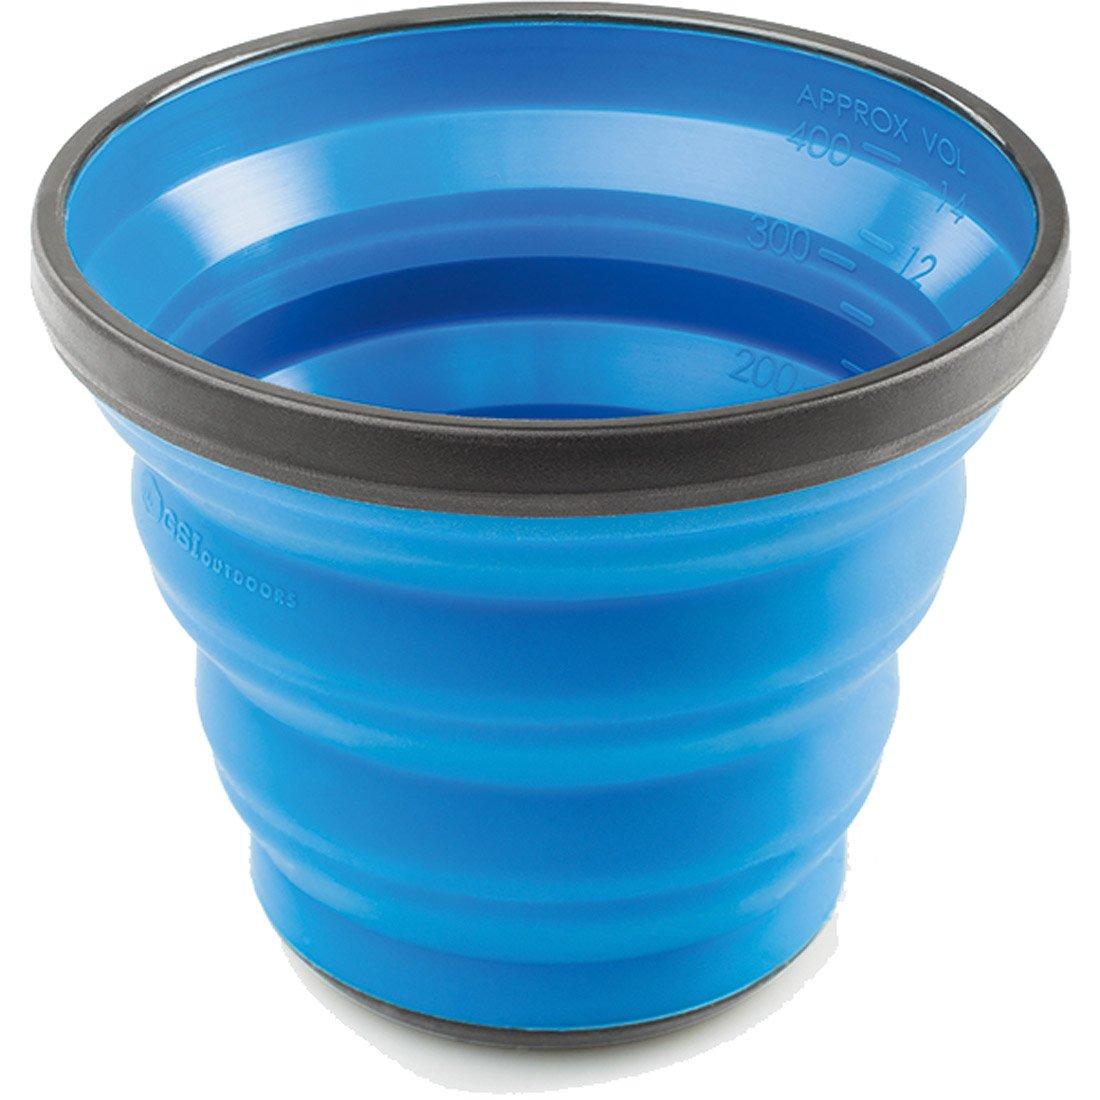 כוס מתקפלת לשטח - Escape 0.5L Cup - GSI